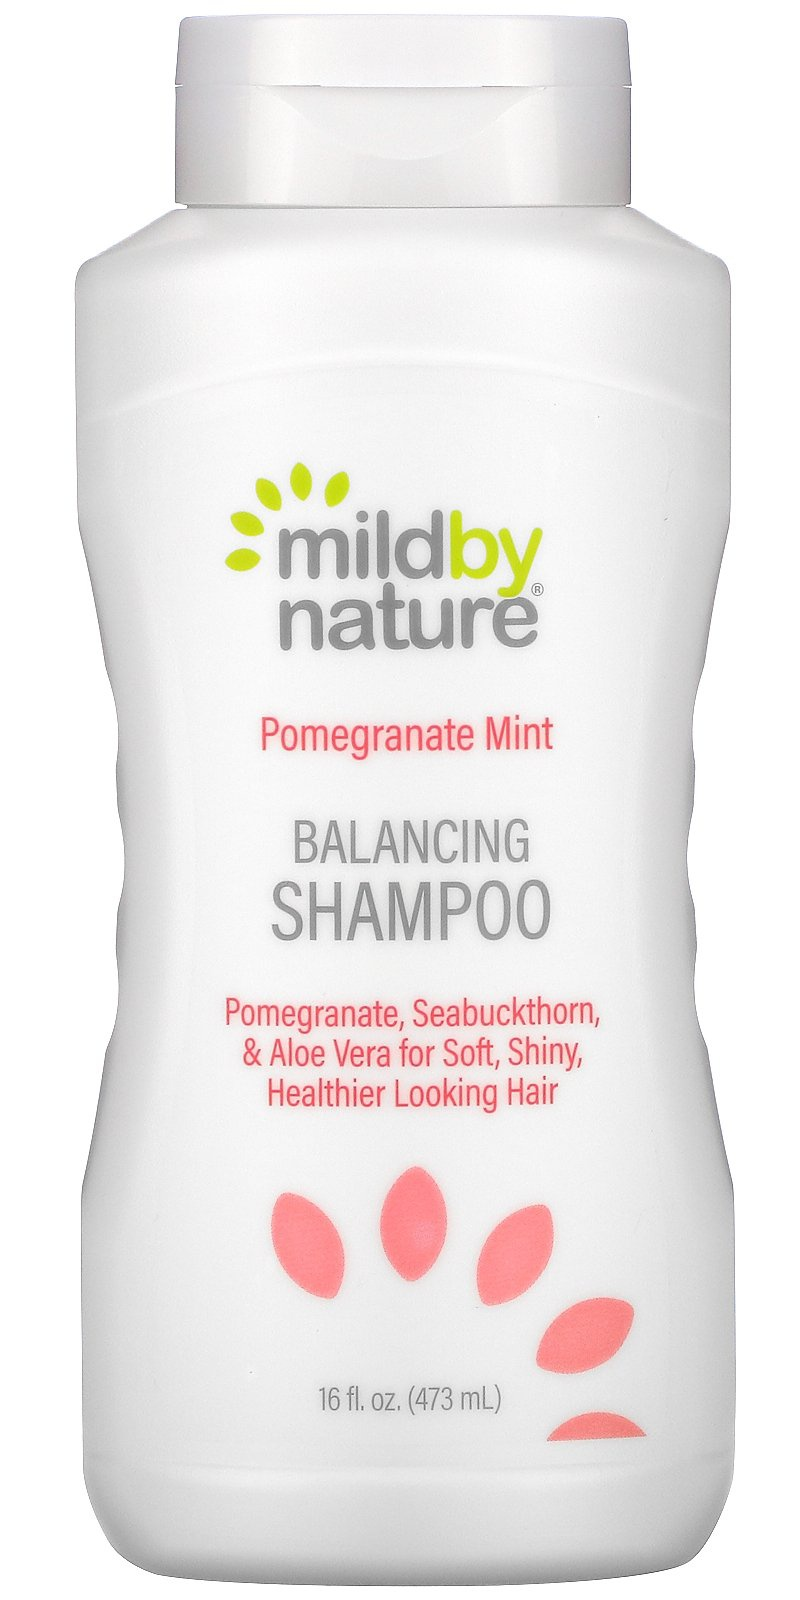 Mild By Nature Pomegranate Mint Balancing Shampoo